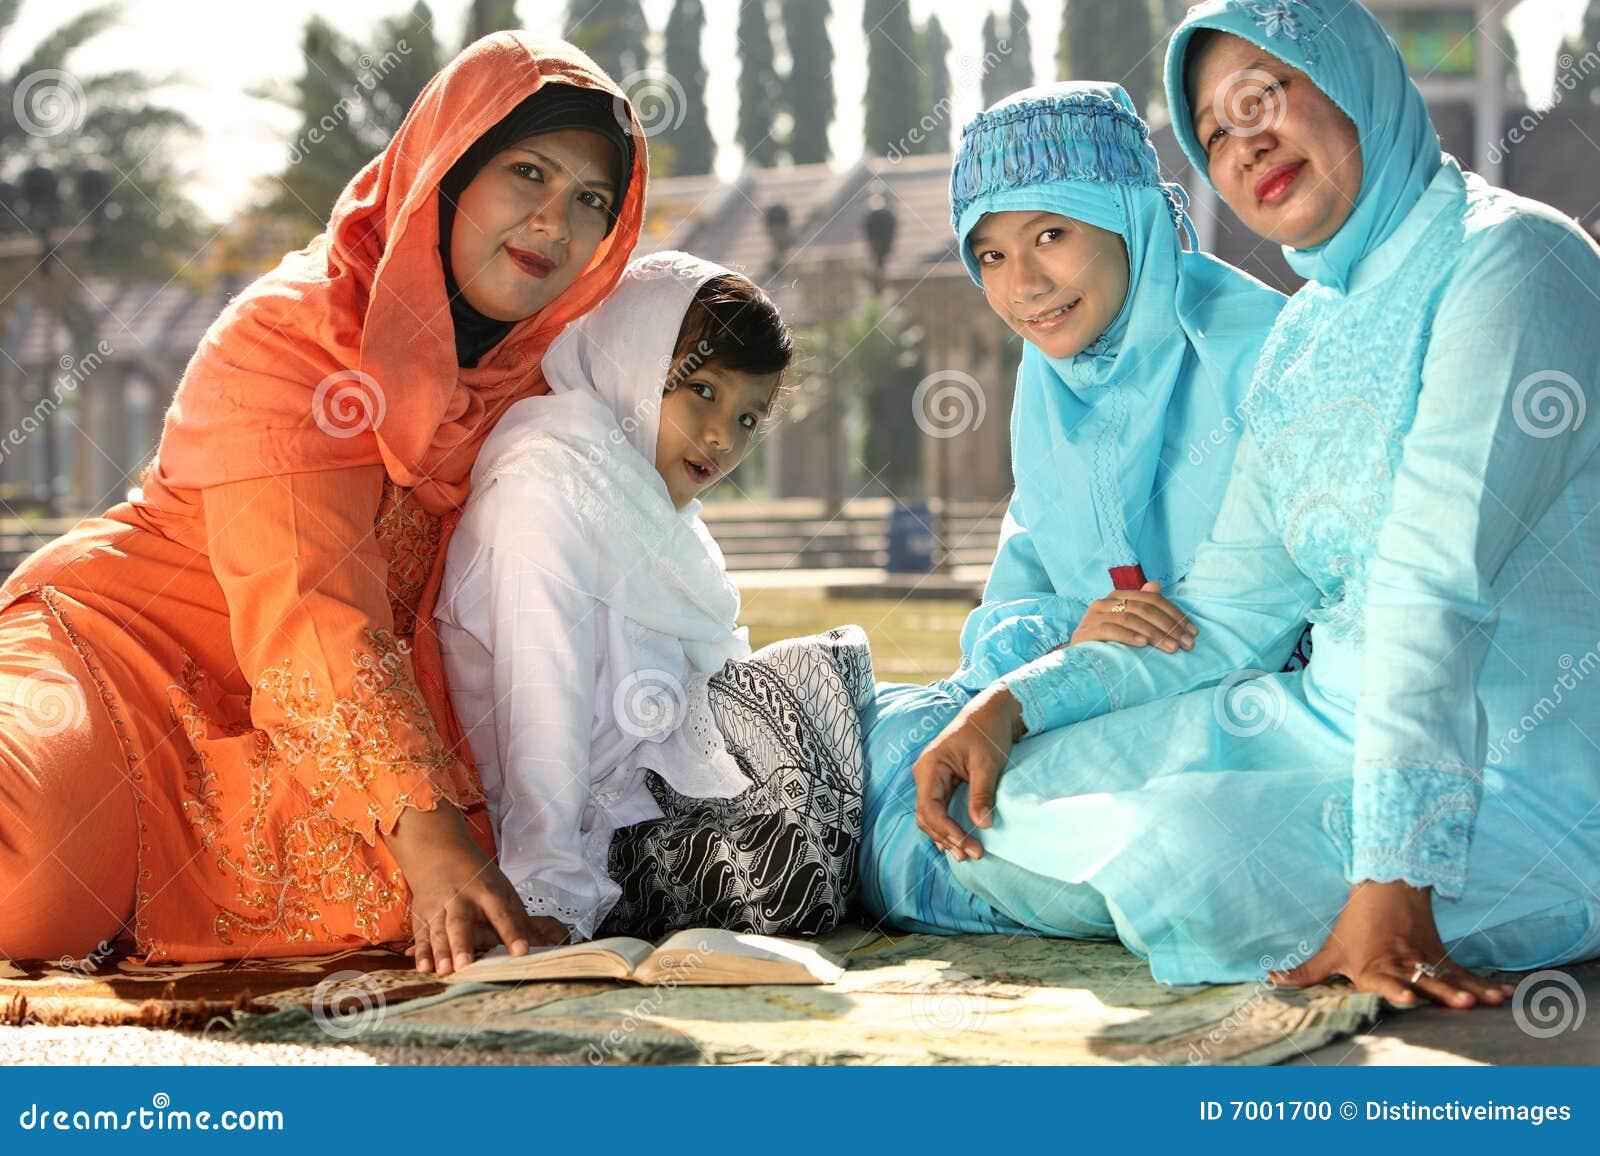 Beauty indonesian hijab girl fuck on the floor - 3 10